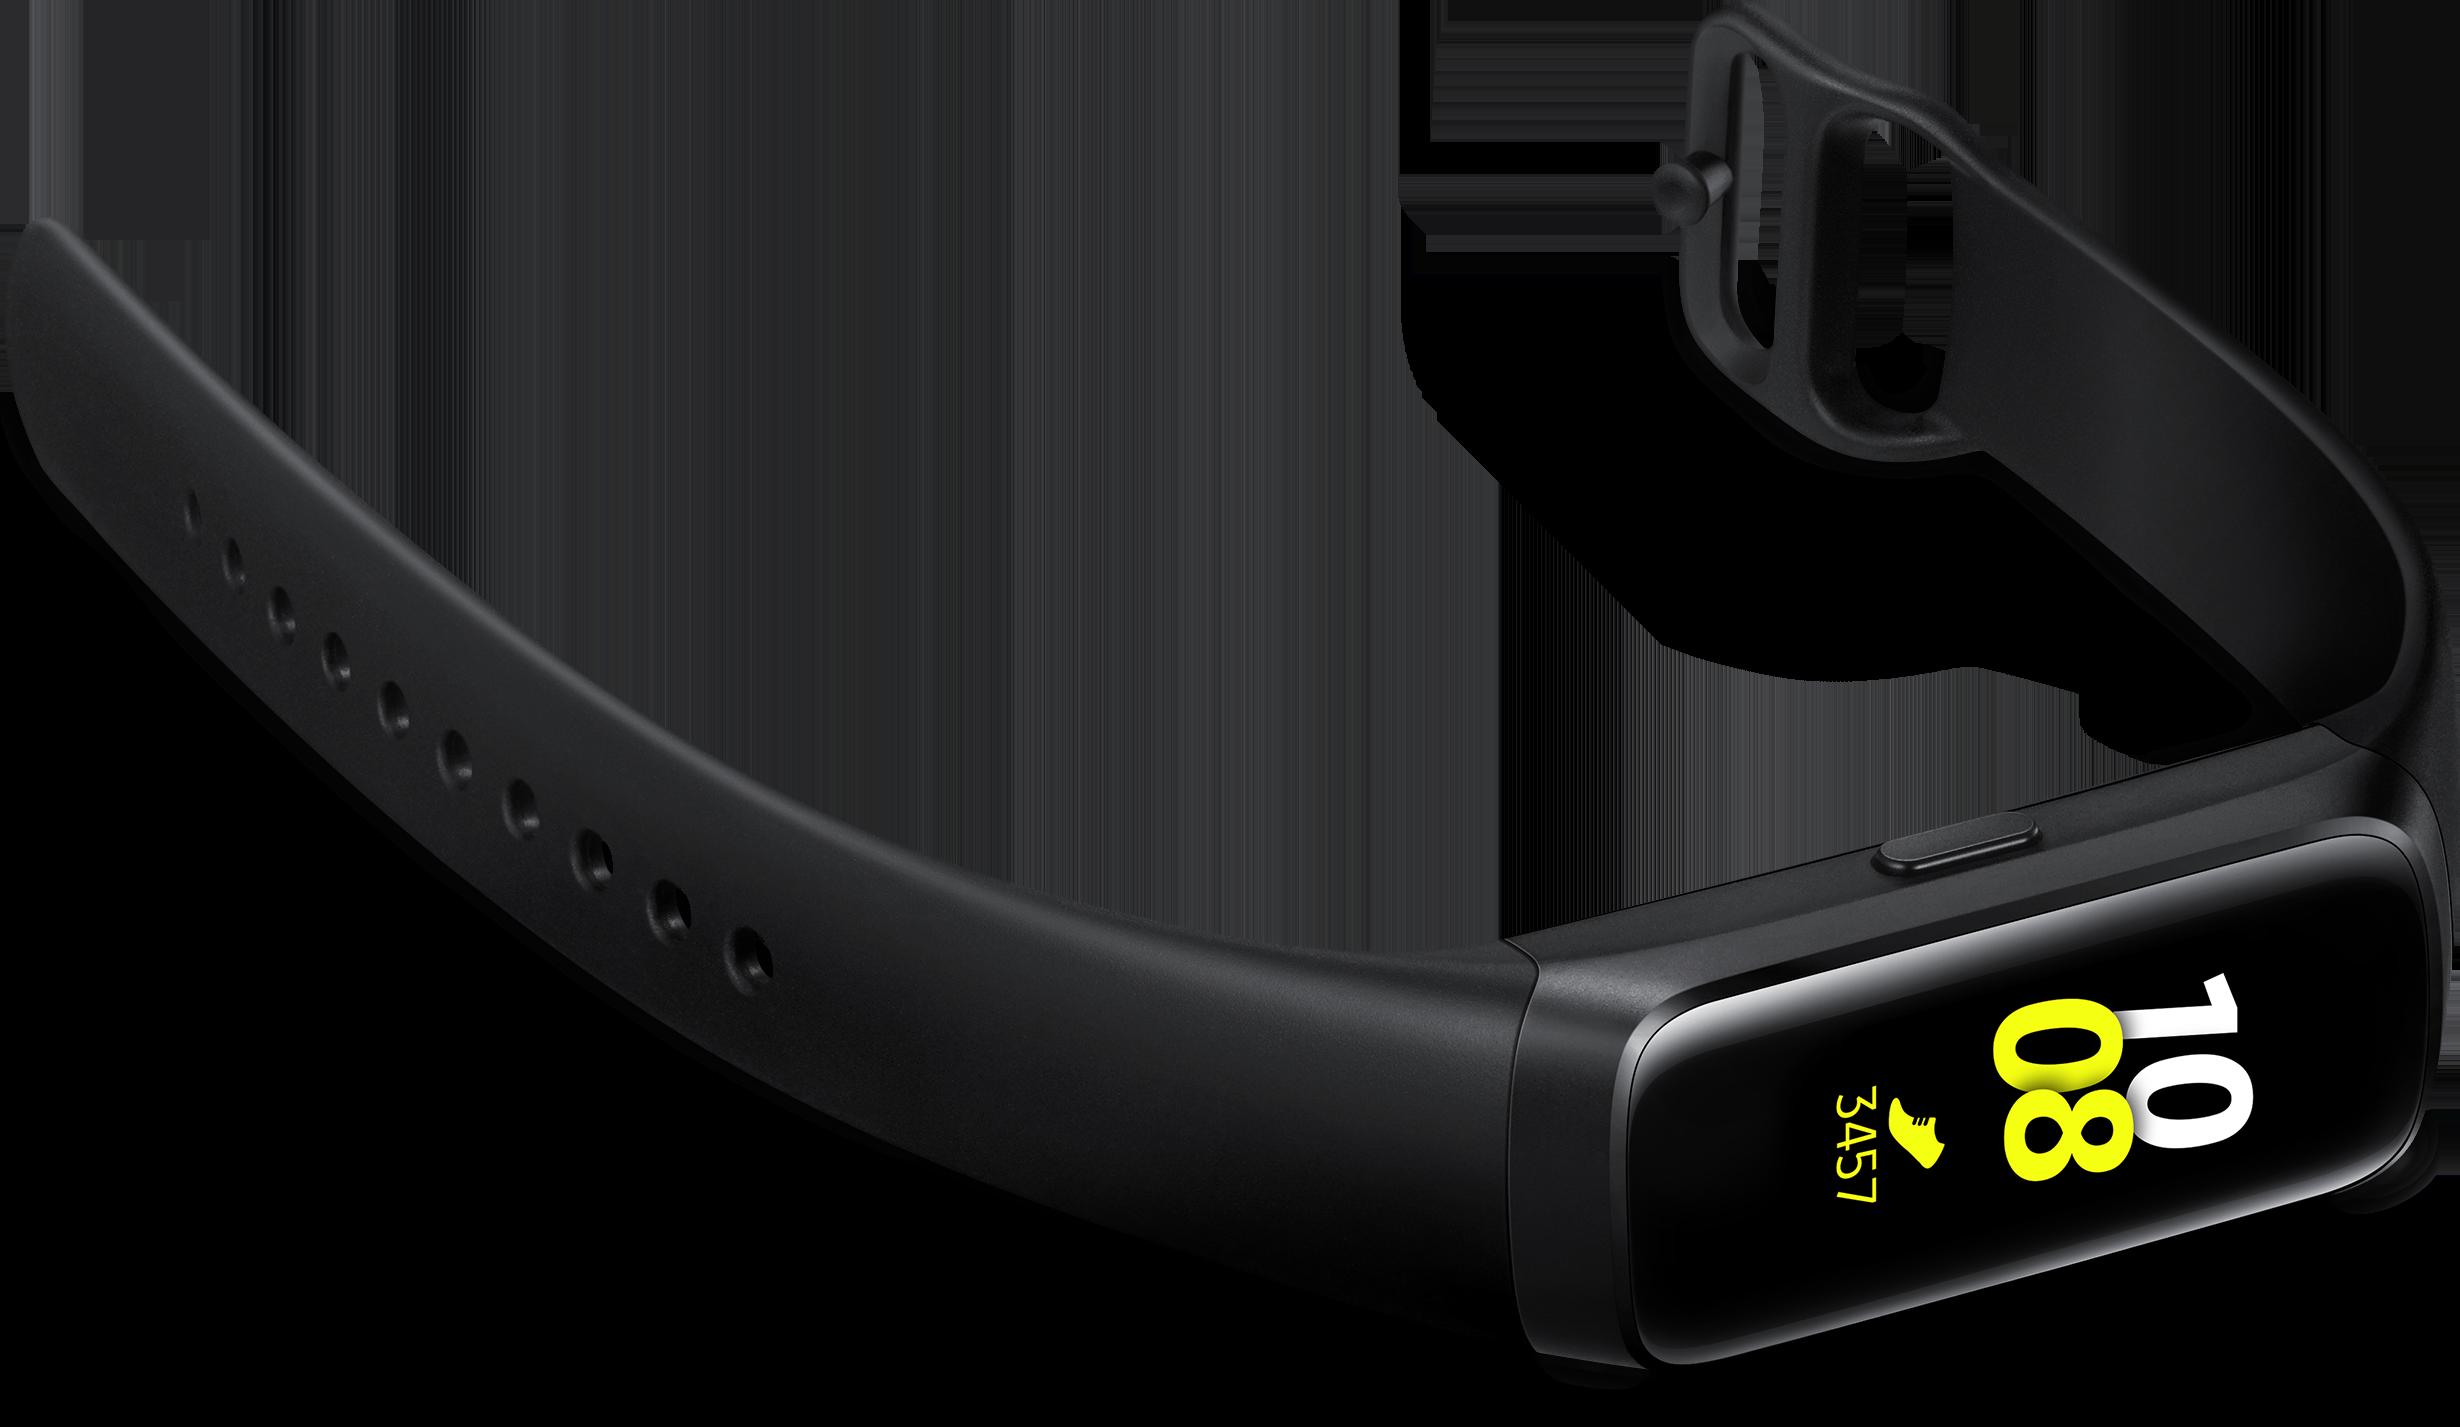 RE35q6x?ver=da19 - Samsung Galaxy Fit Smart Watch